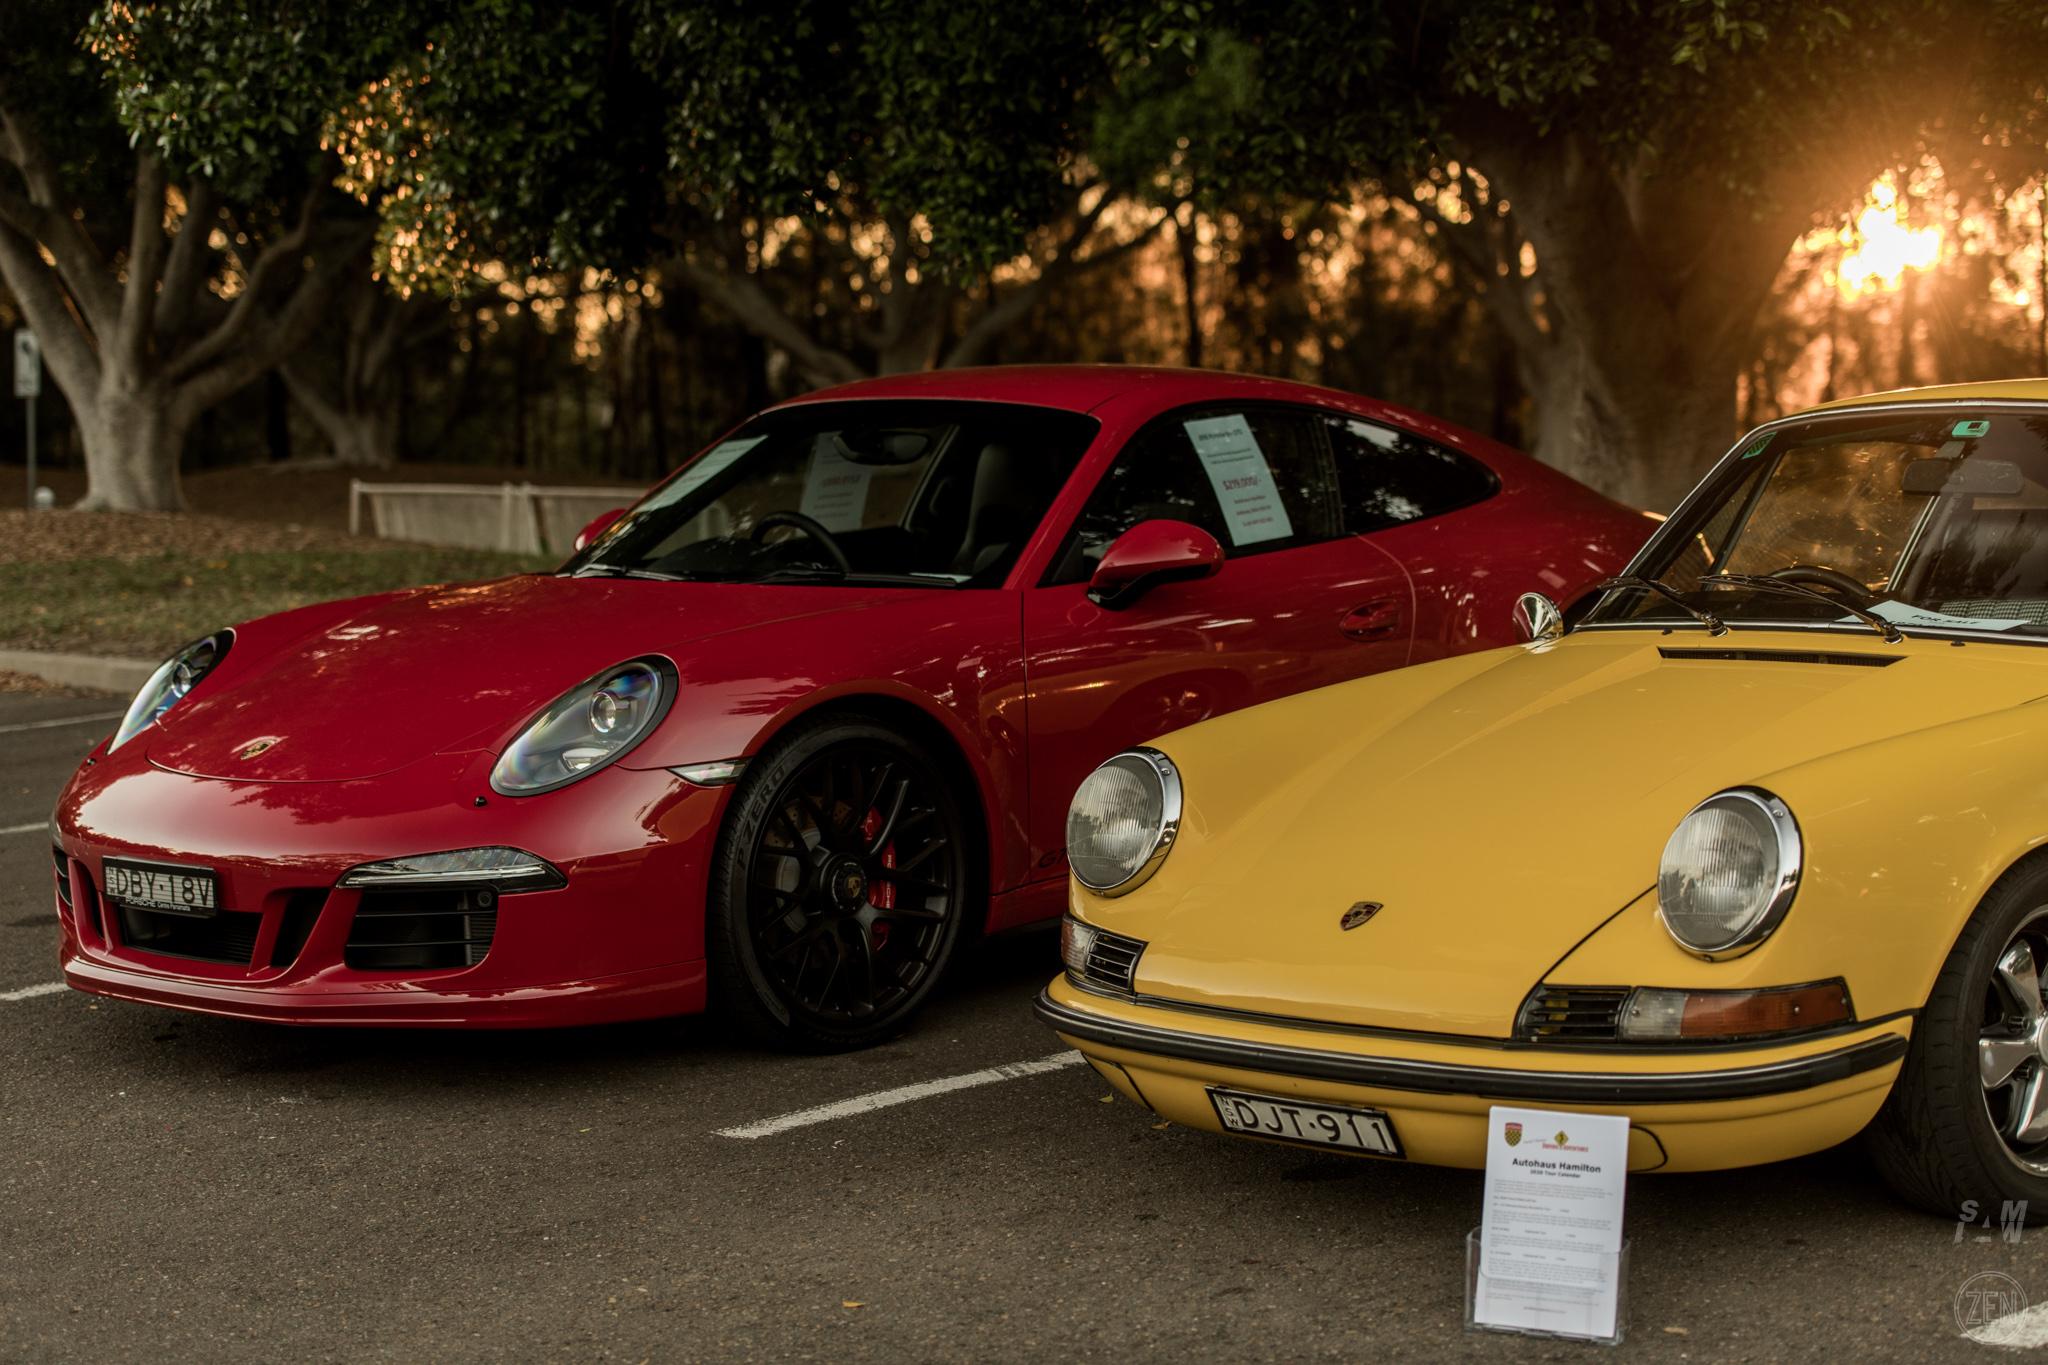 2019-10-27 - Autohaus Porsches & Coffee 004